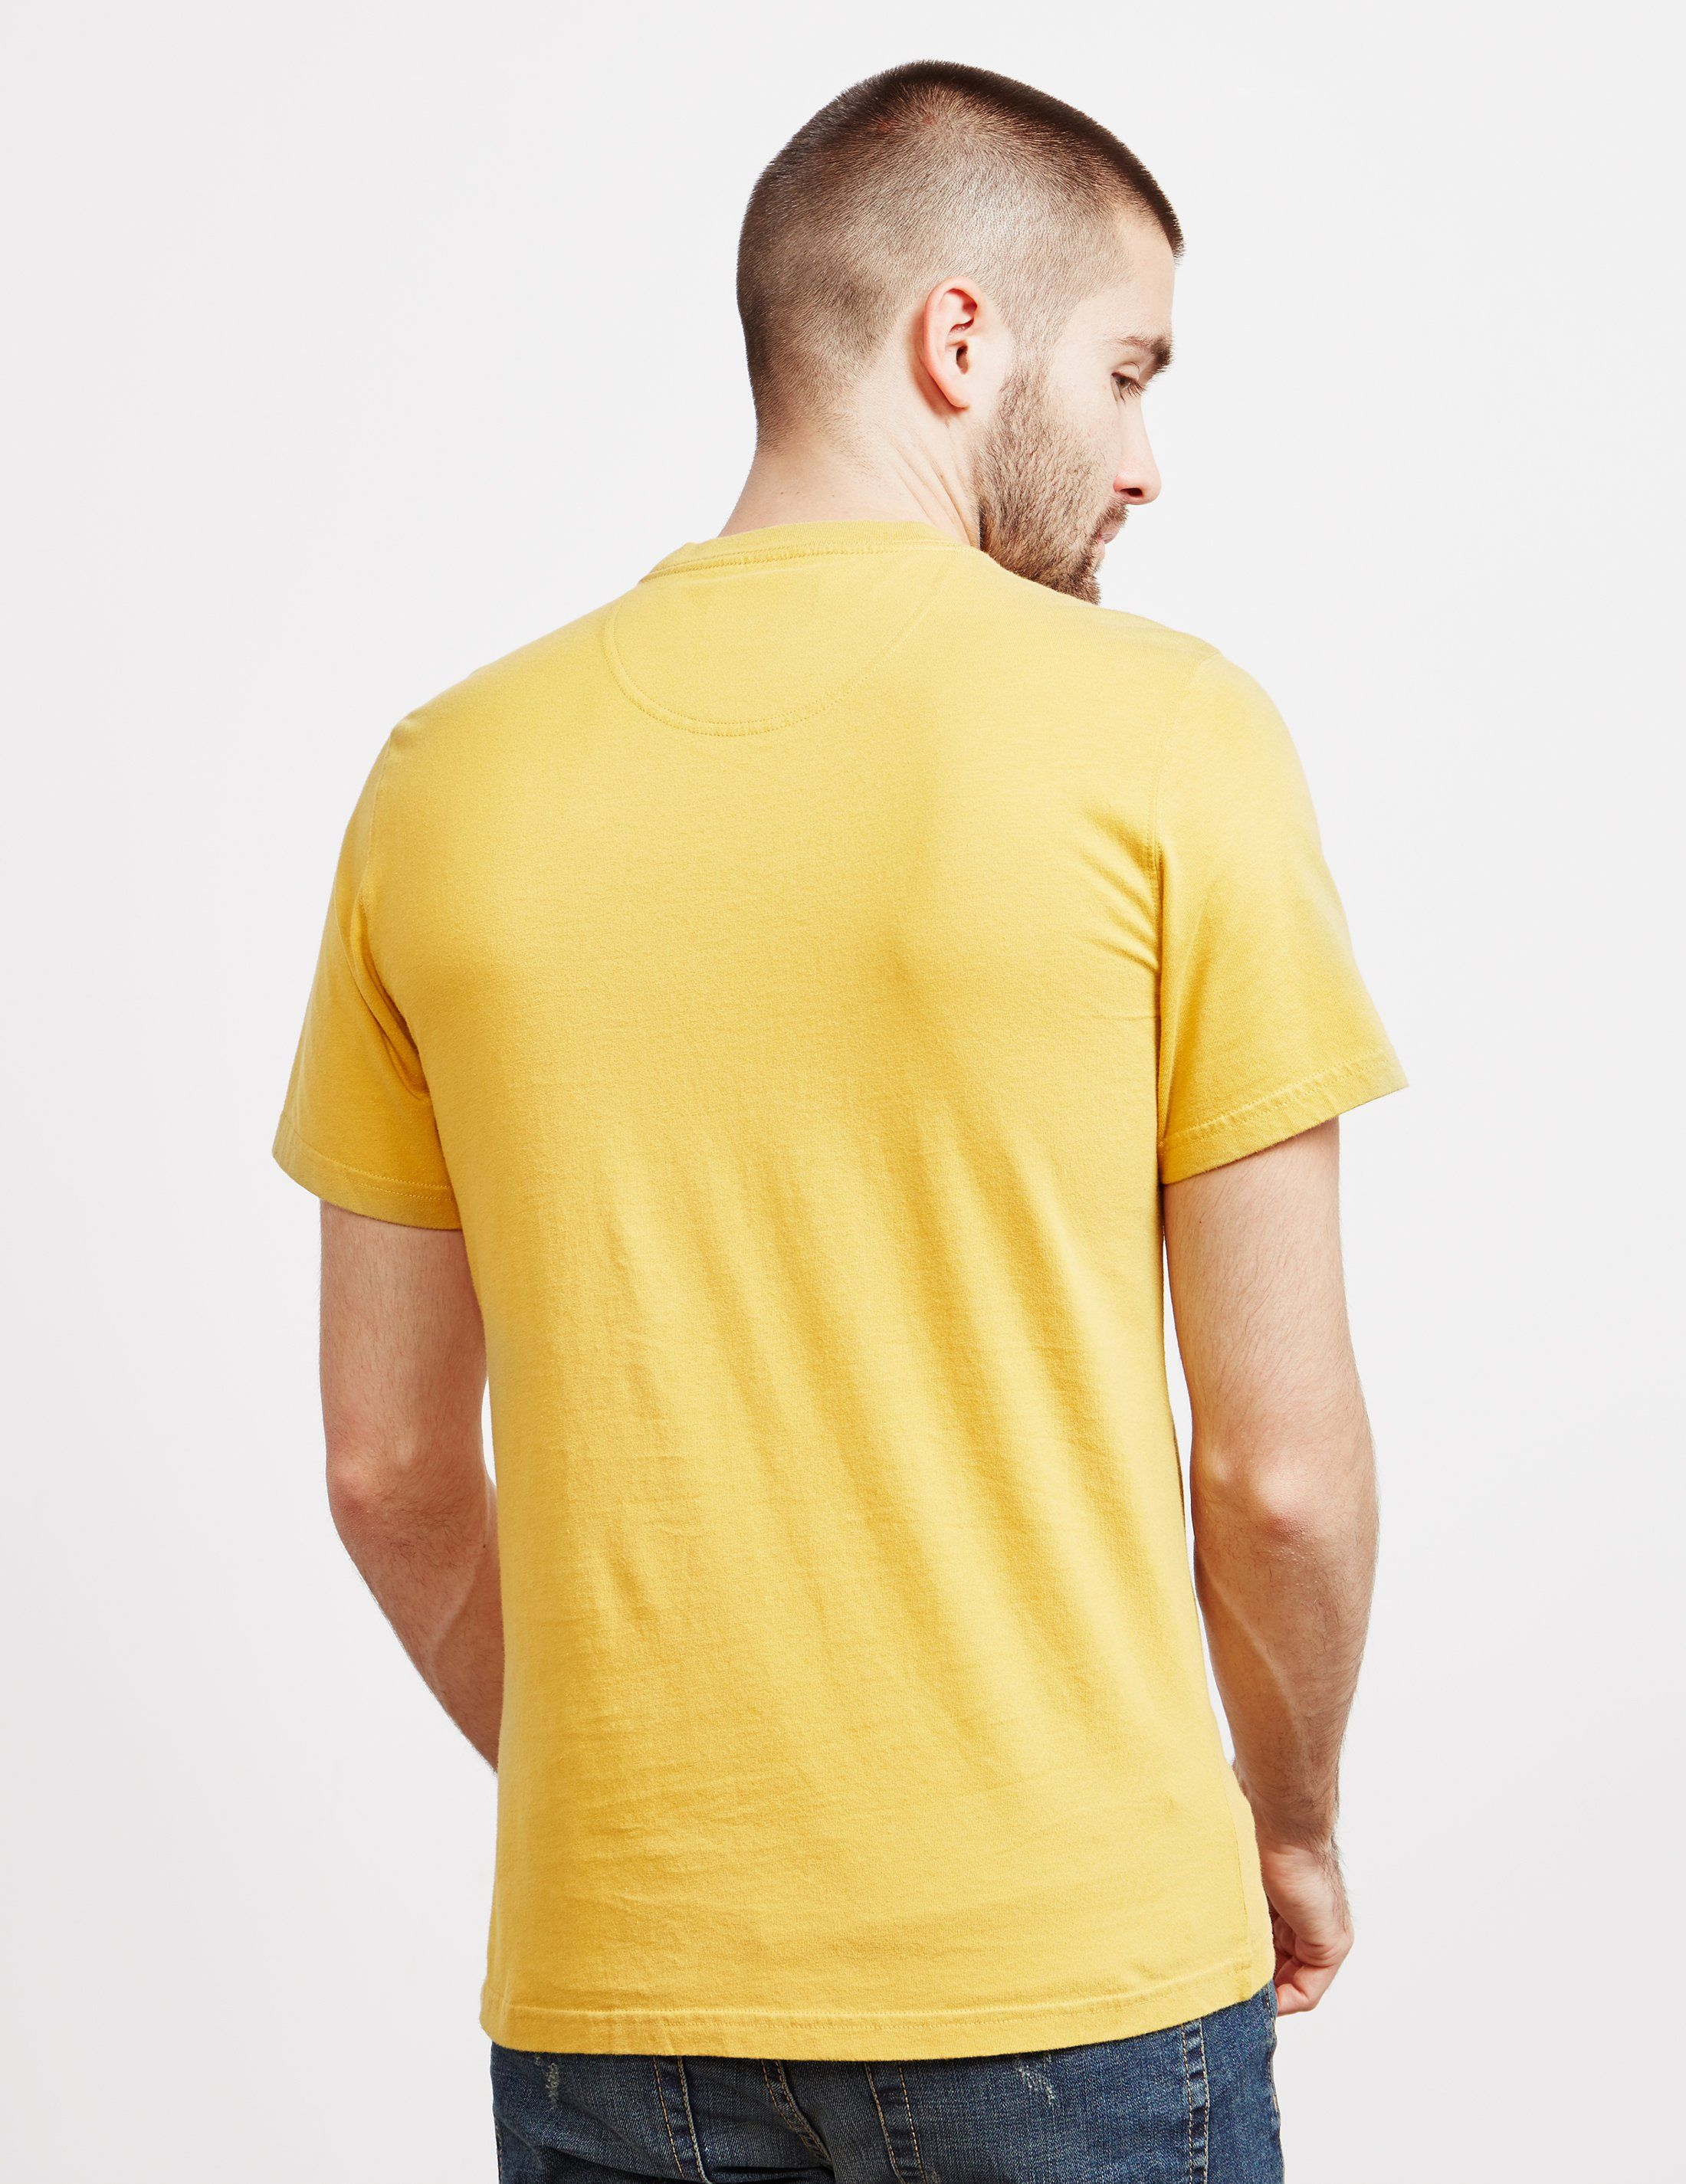 Barbour International Grill Short Sleeve T-Shirt